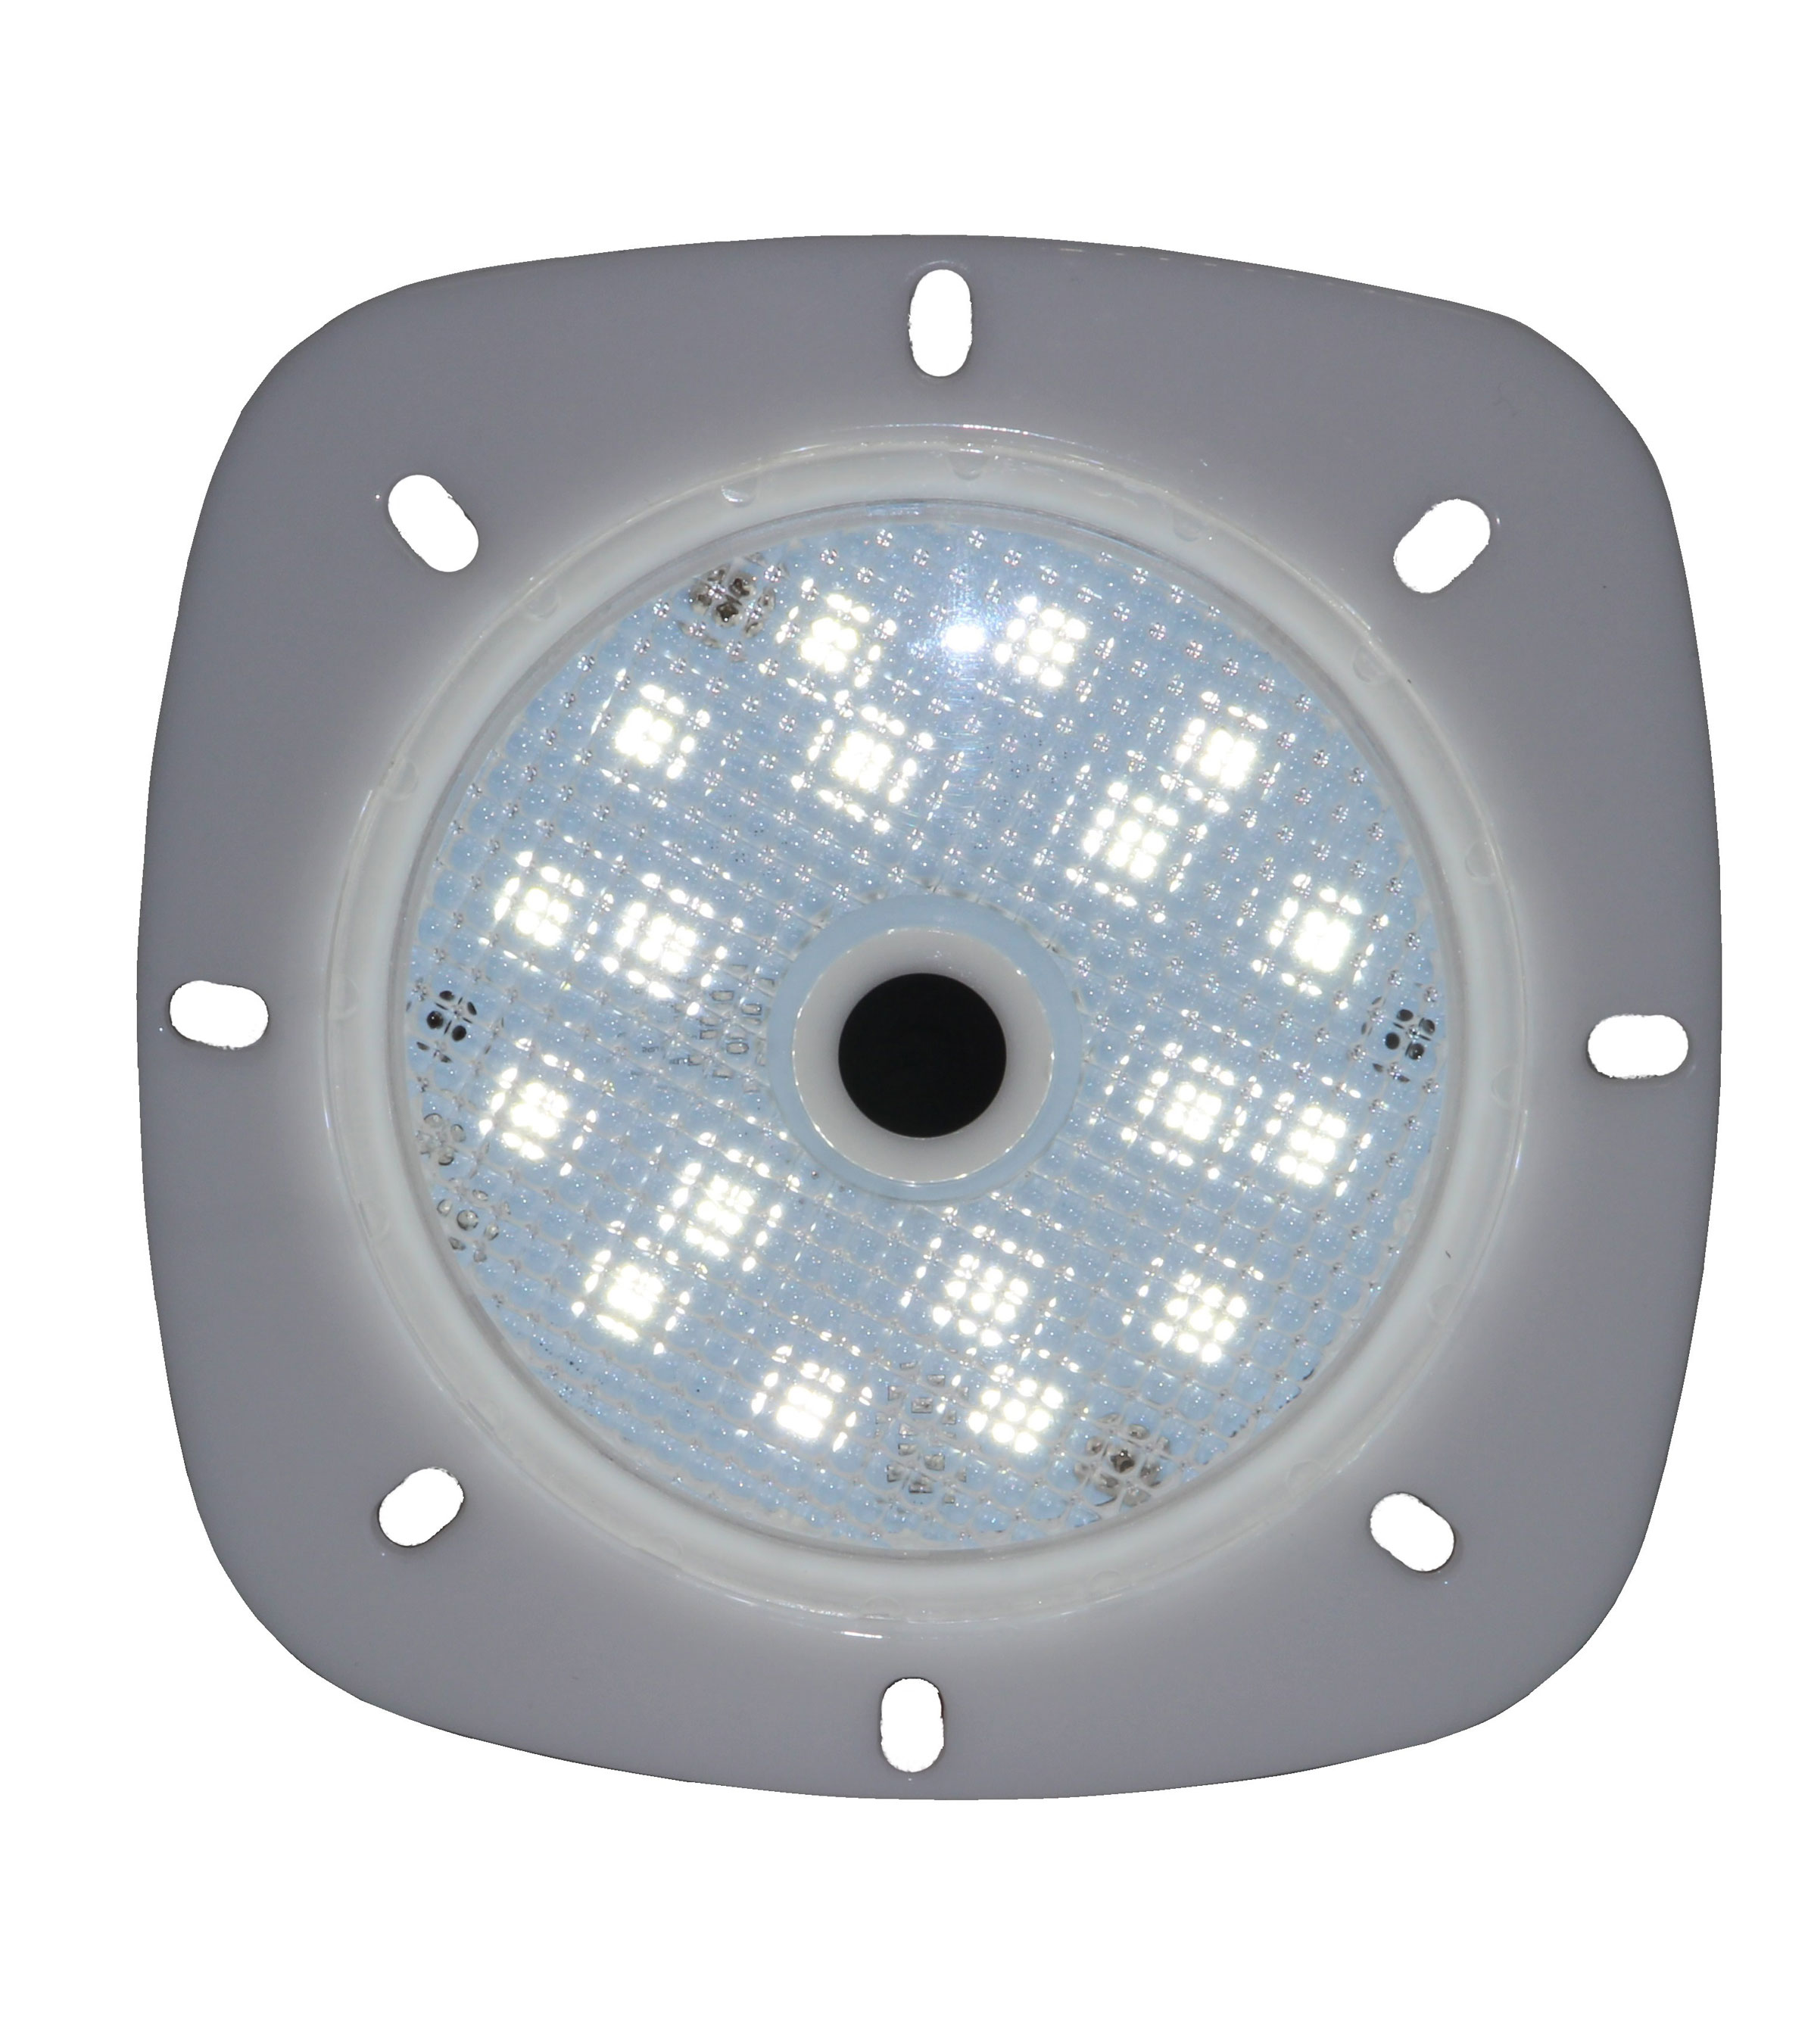 Poolbeleuchtung LED myPool LED-Magnet-Scheinwerfer grau/RGB Bild 1